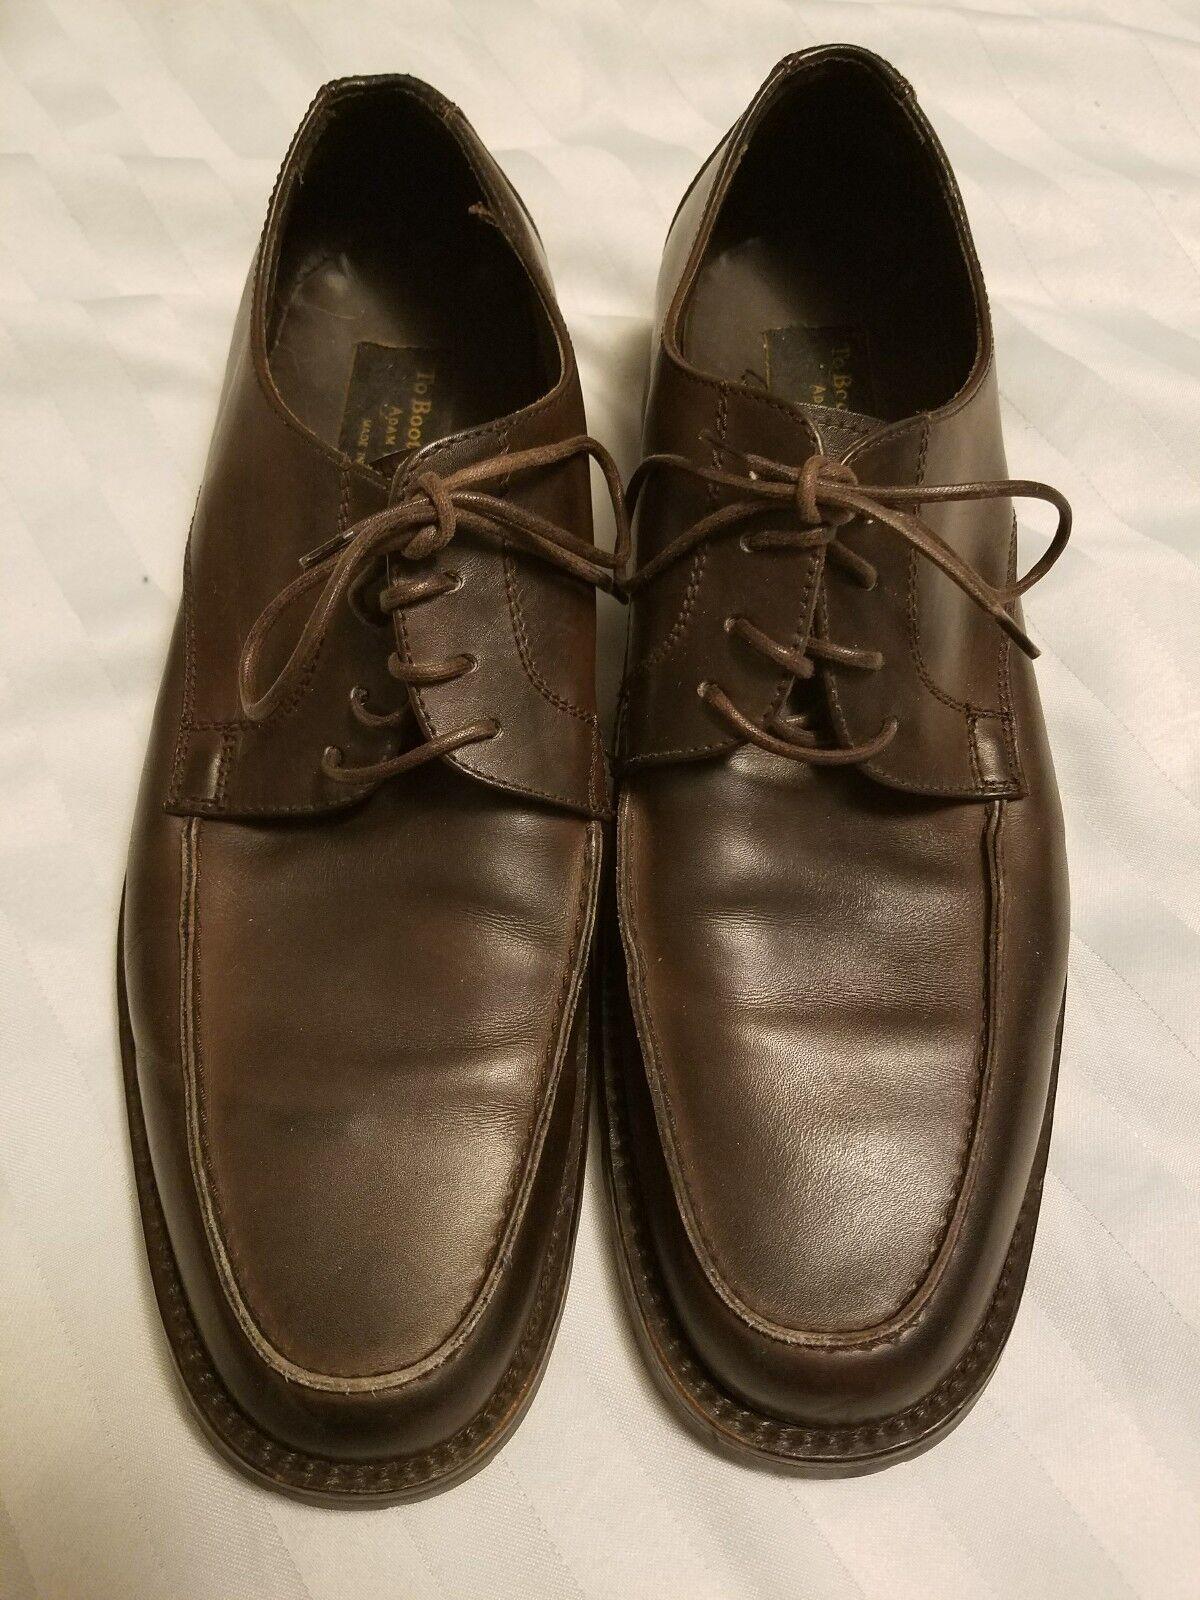 TO BOOT NEW YORK Uomo Dress Scarpe Dark marrone Pelle Italian Oxfords Taglia 11 1/2